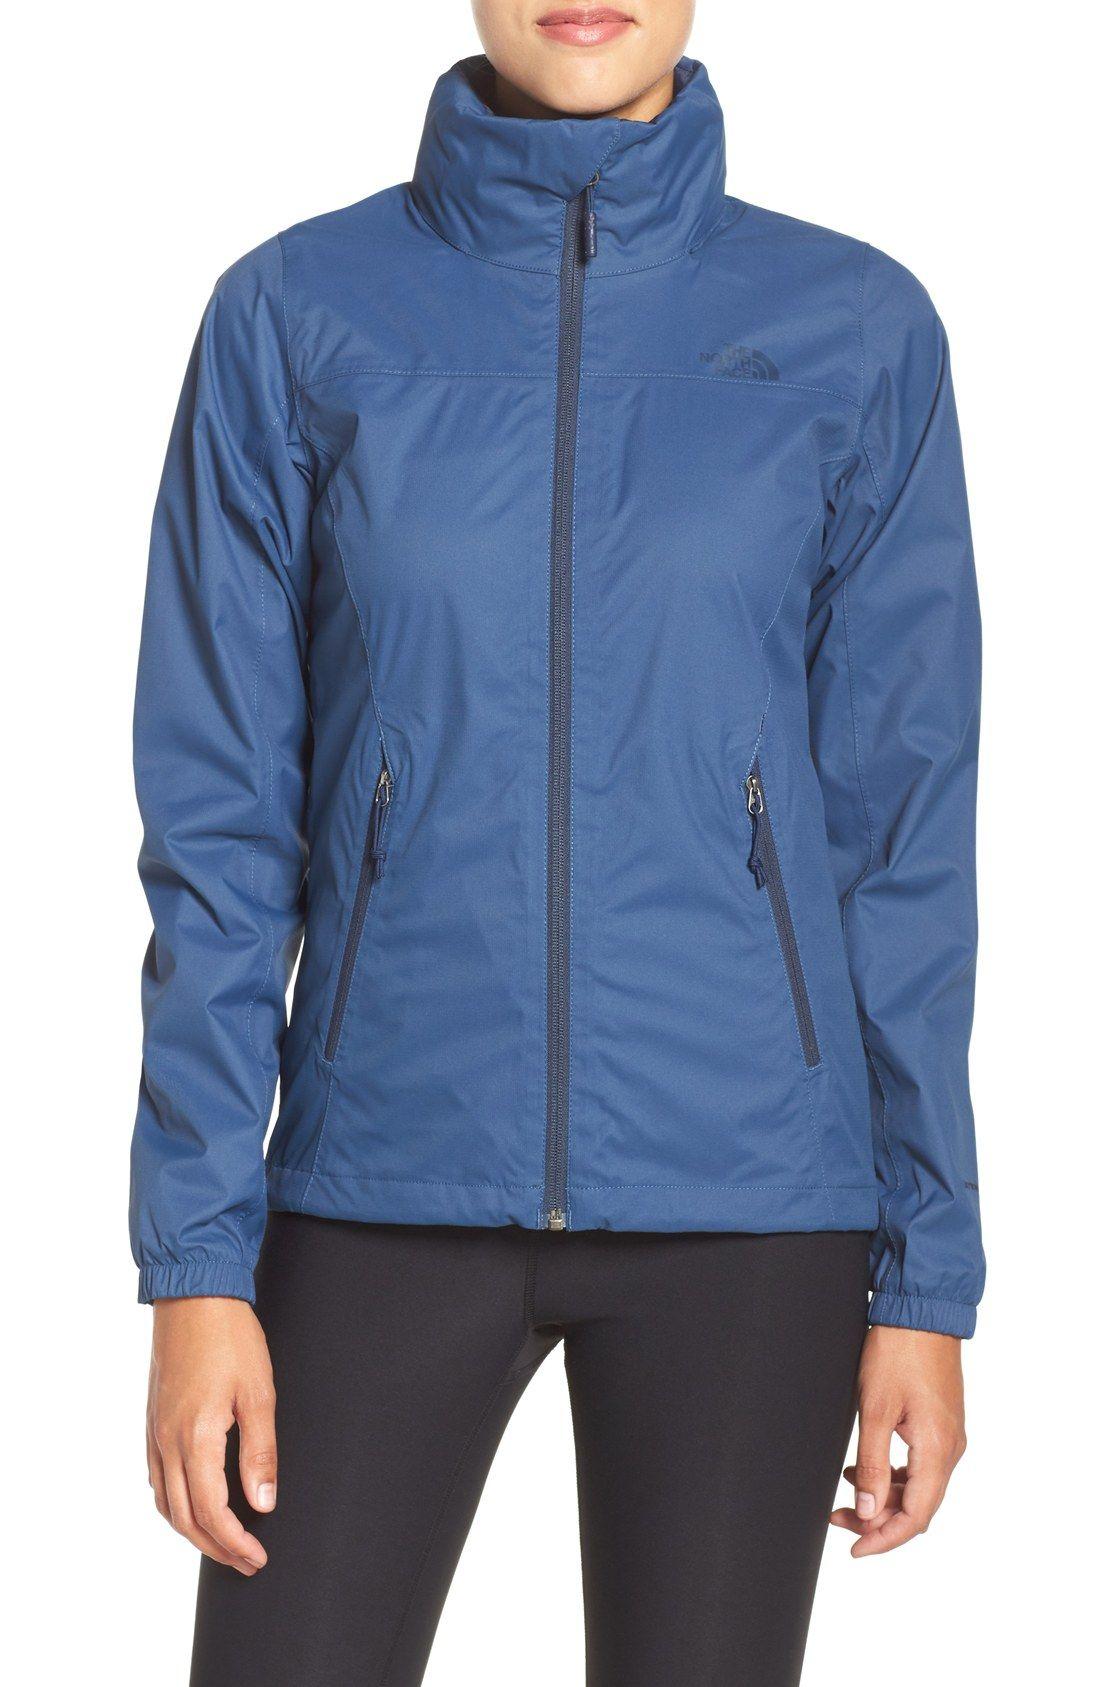 northface jackets plus size women - google search | fall